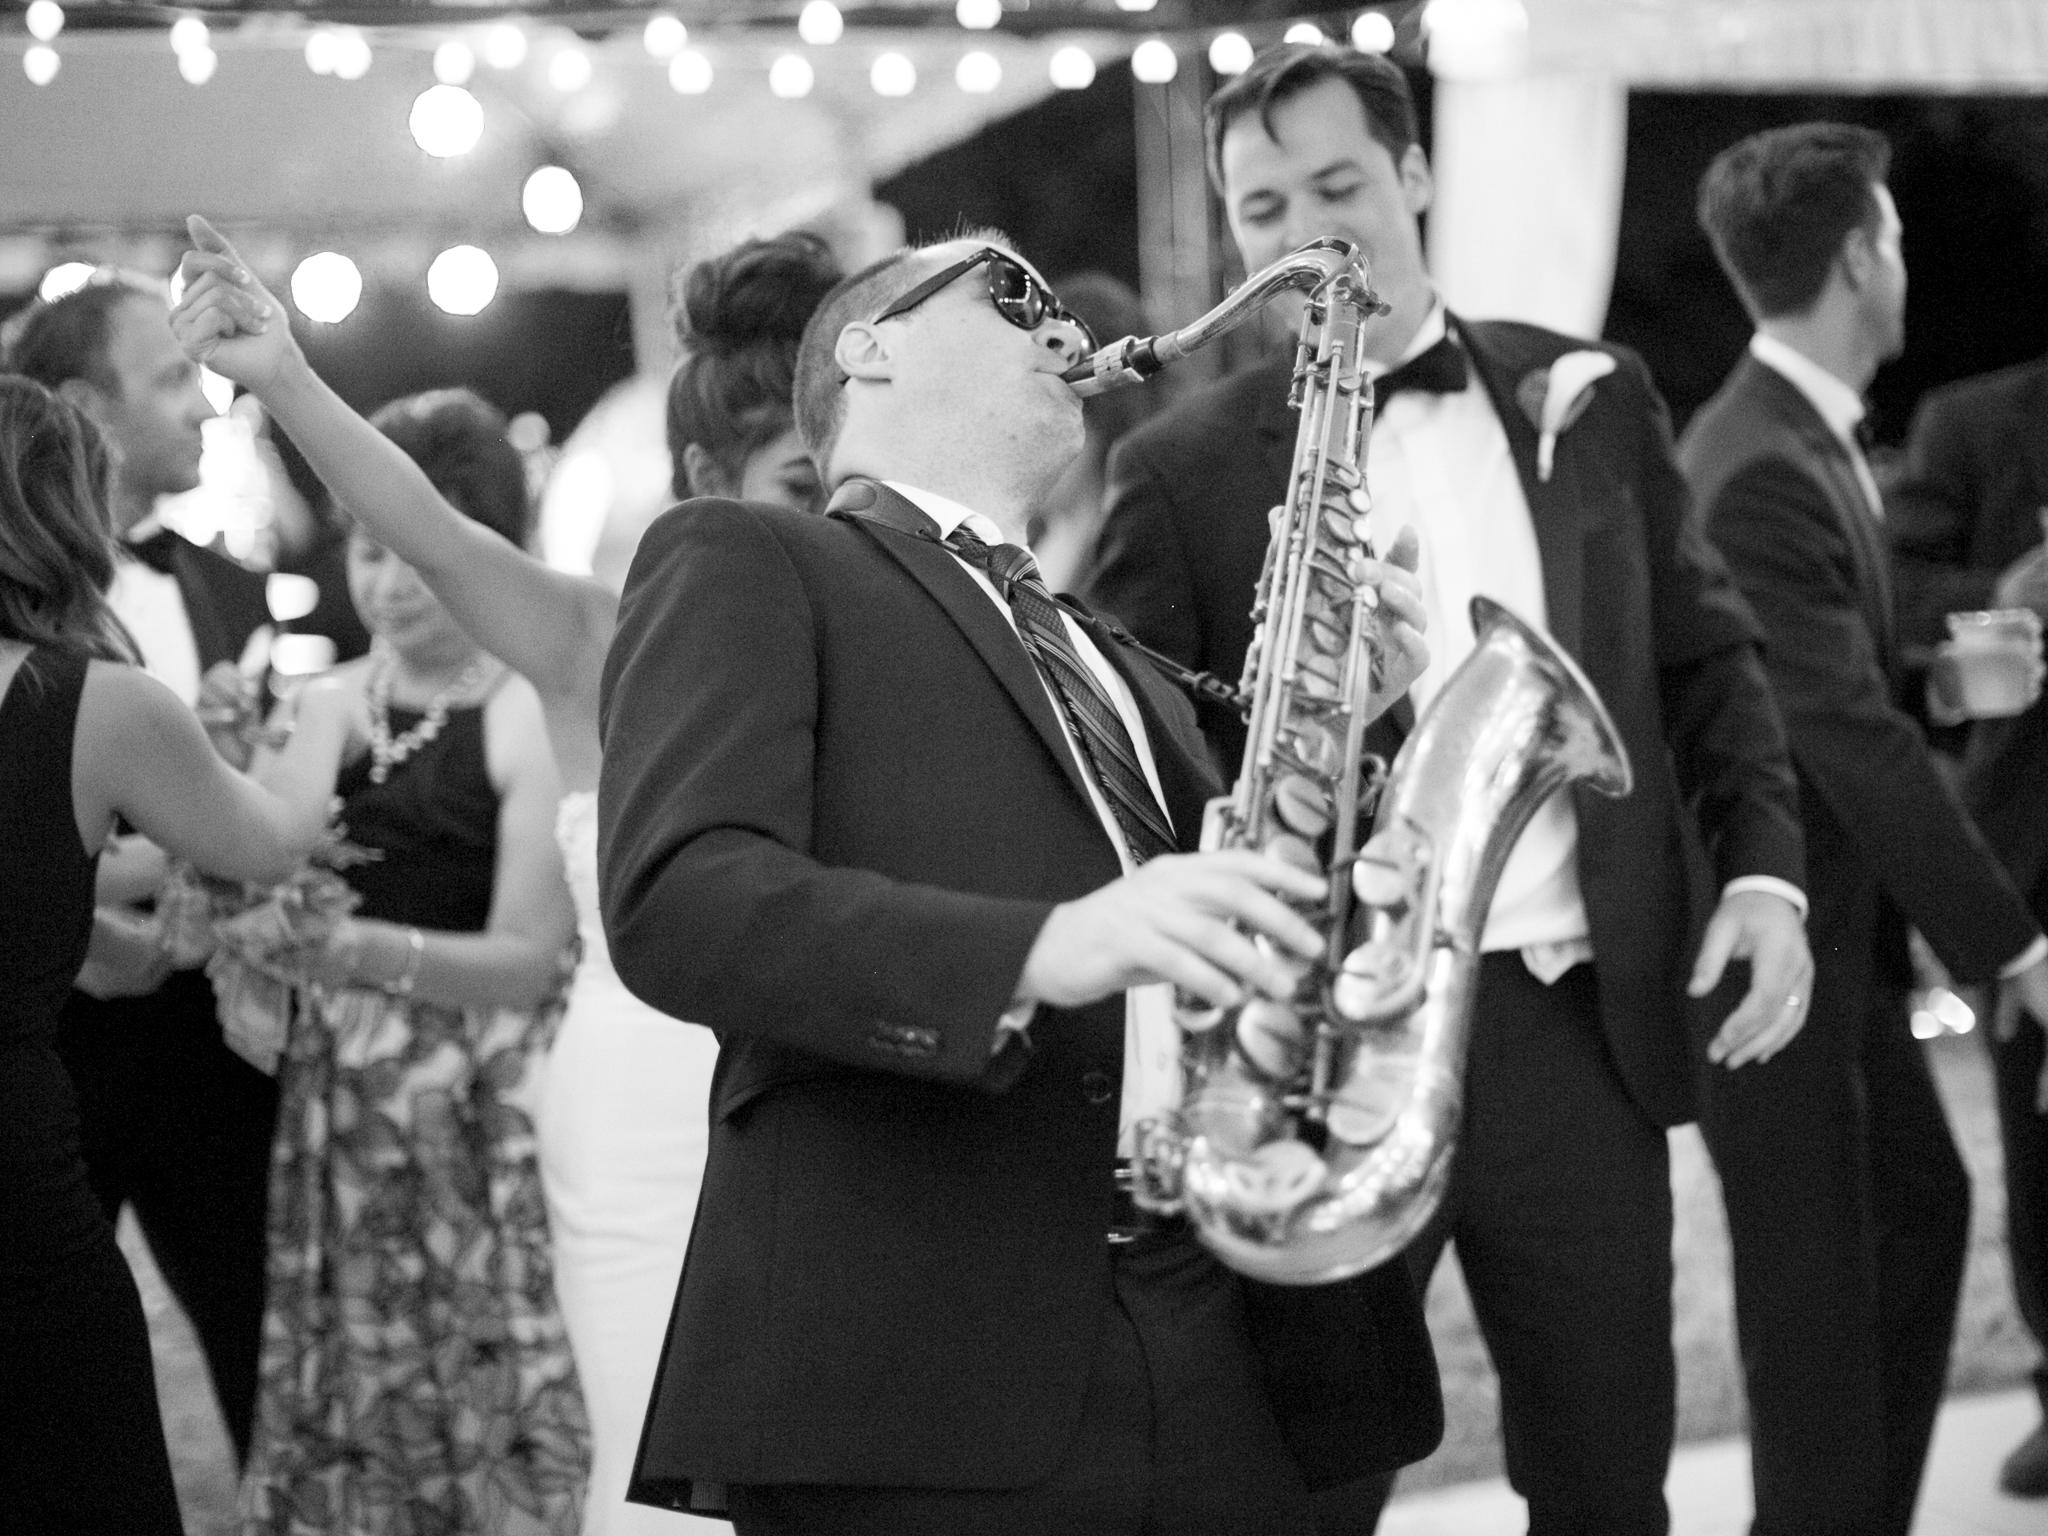 218OutliveCreative_Travel_Photographer_Videographer_Lewis&Clark_Oregon_Elegant_BlackTie_Destination_Wedding.jpg